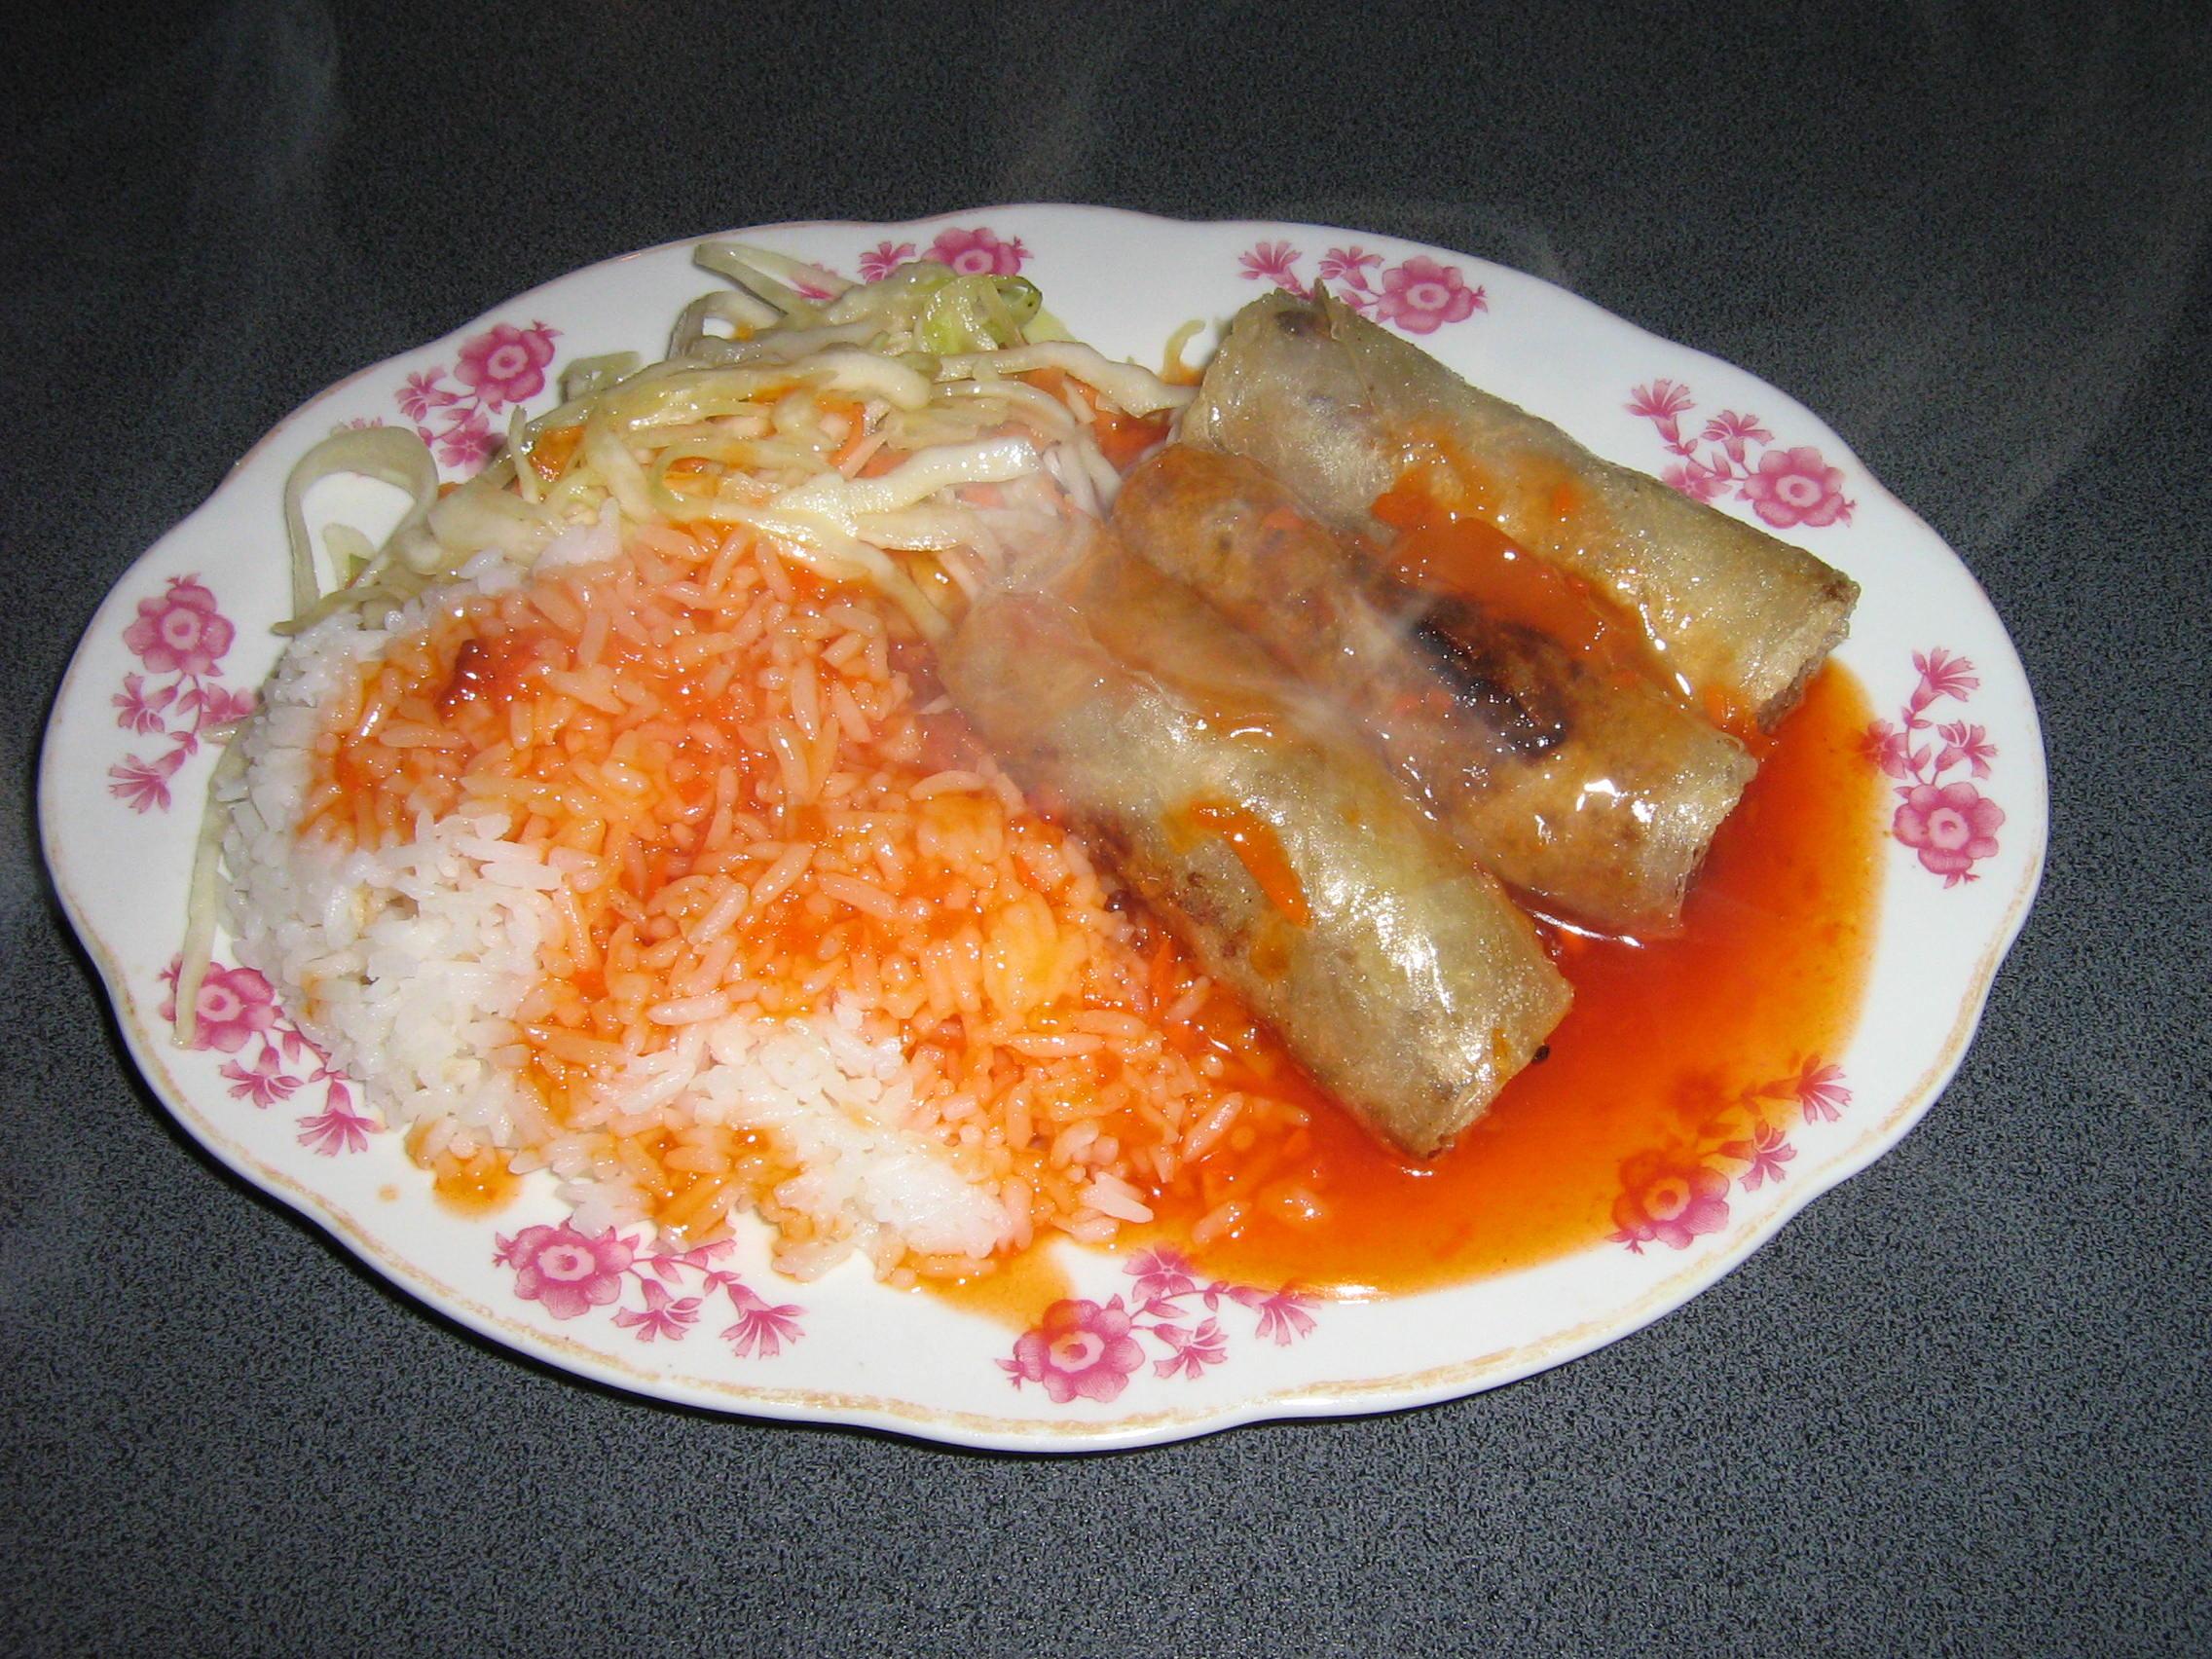 Kuchnia Wietnamska Wikipedia Wolna Encyklopedia